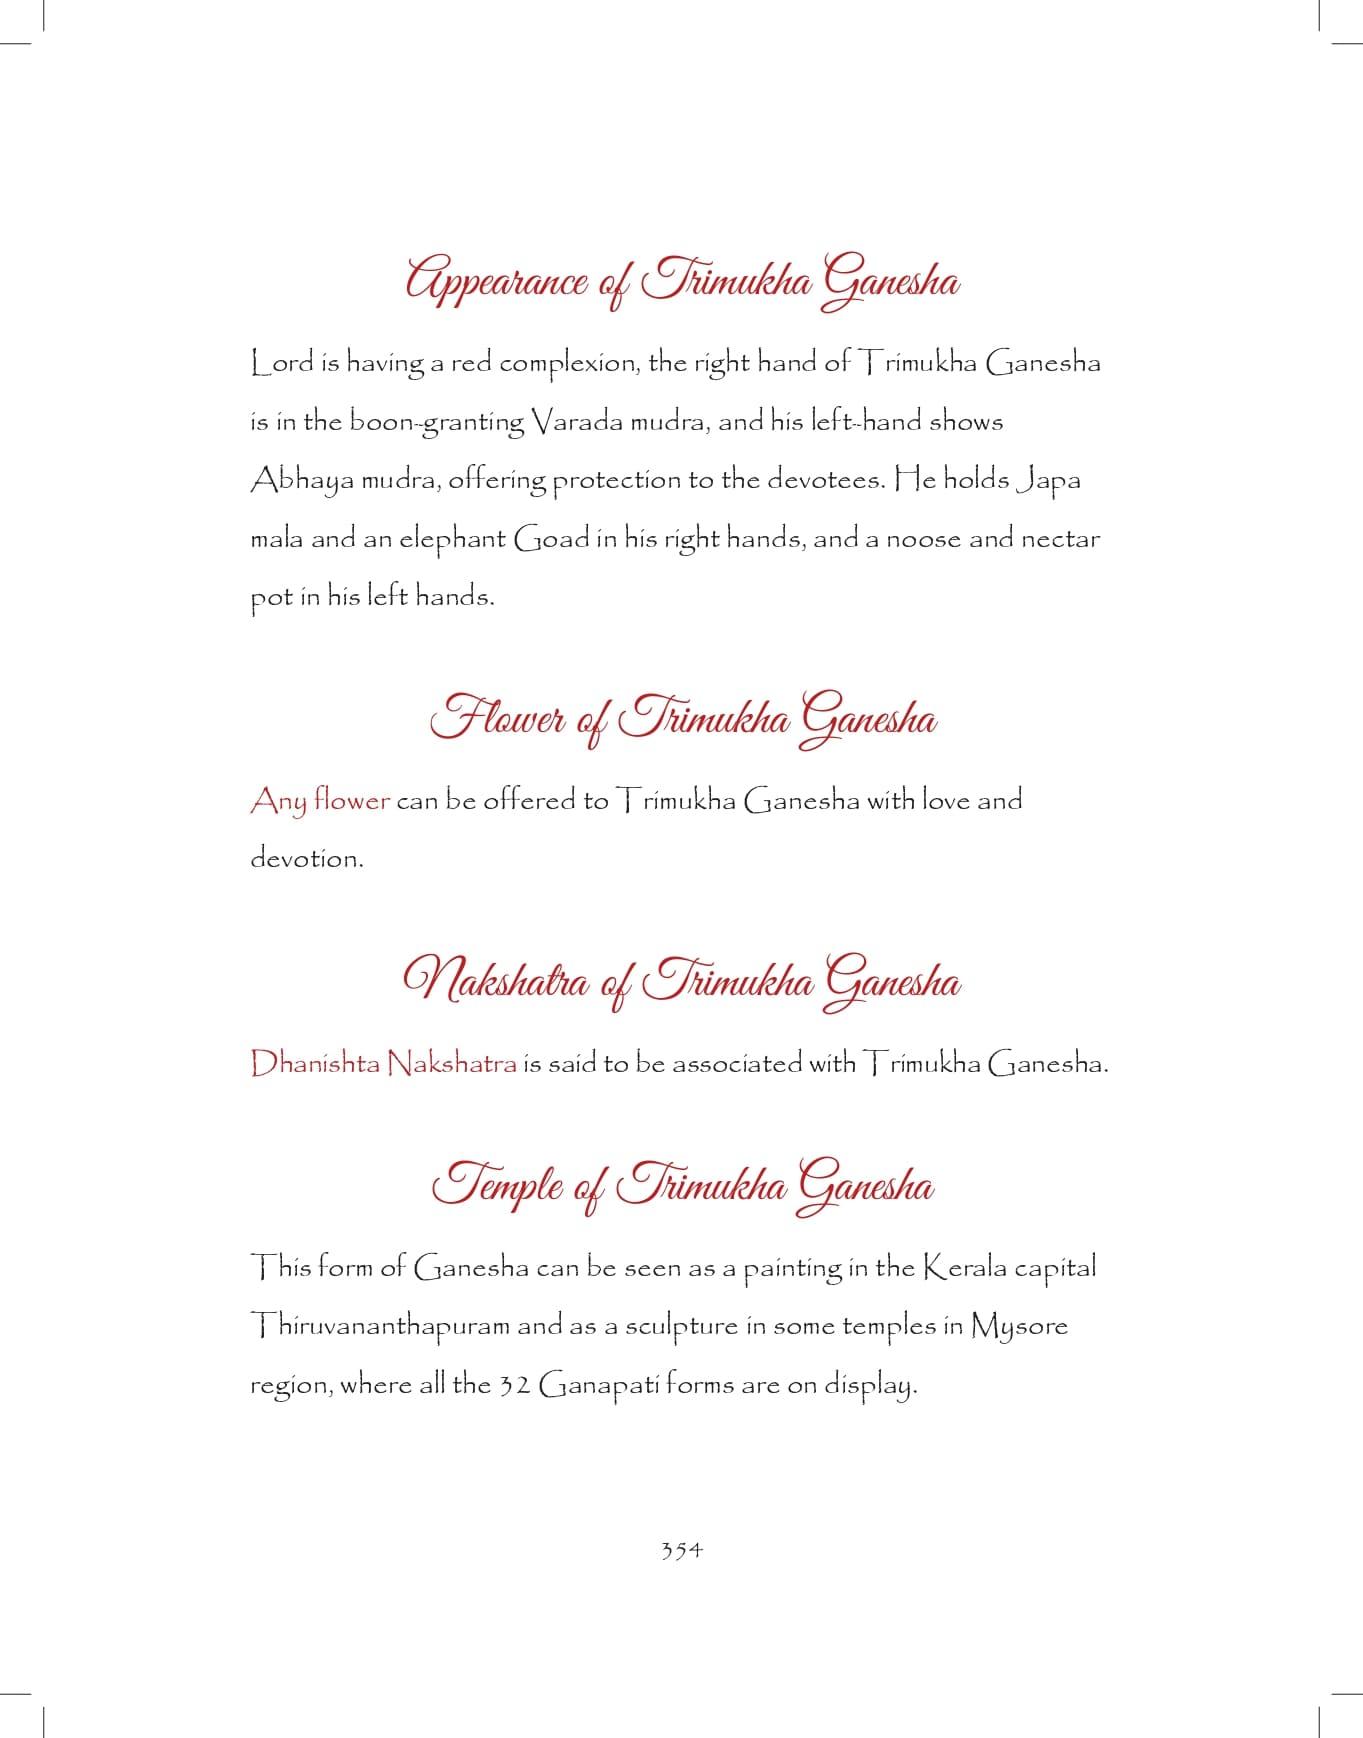 Ganesh-print_pages-to-jpg-0354.jpg